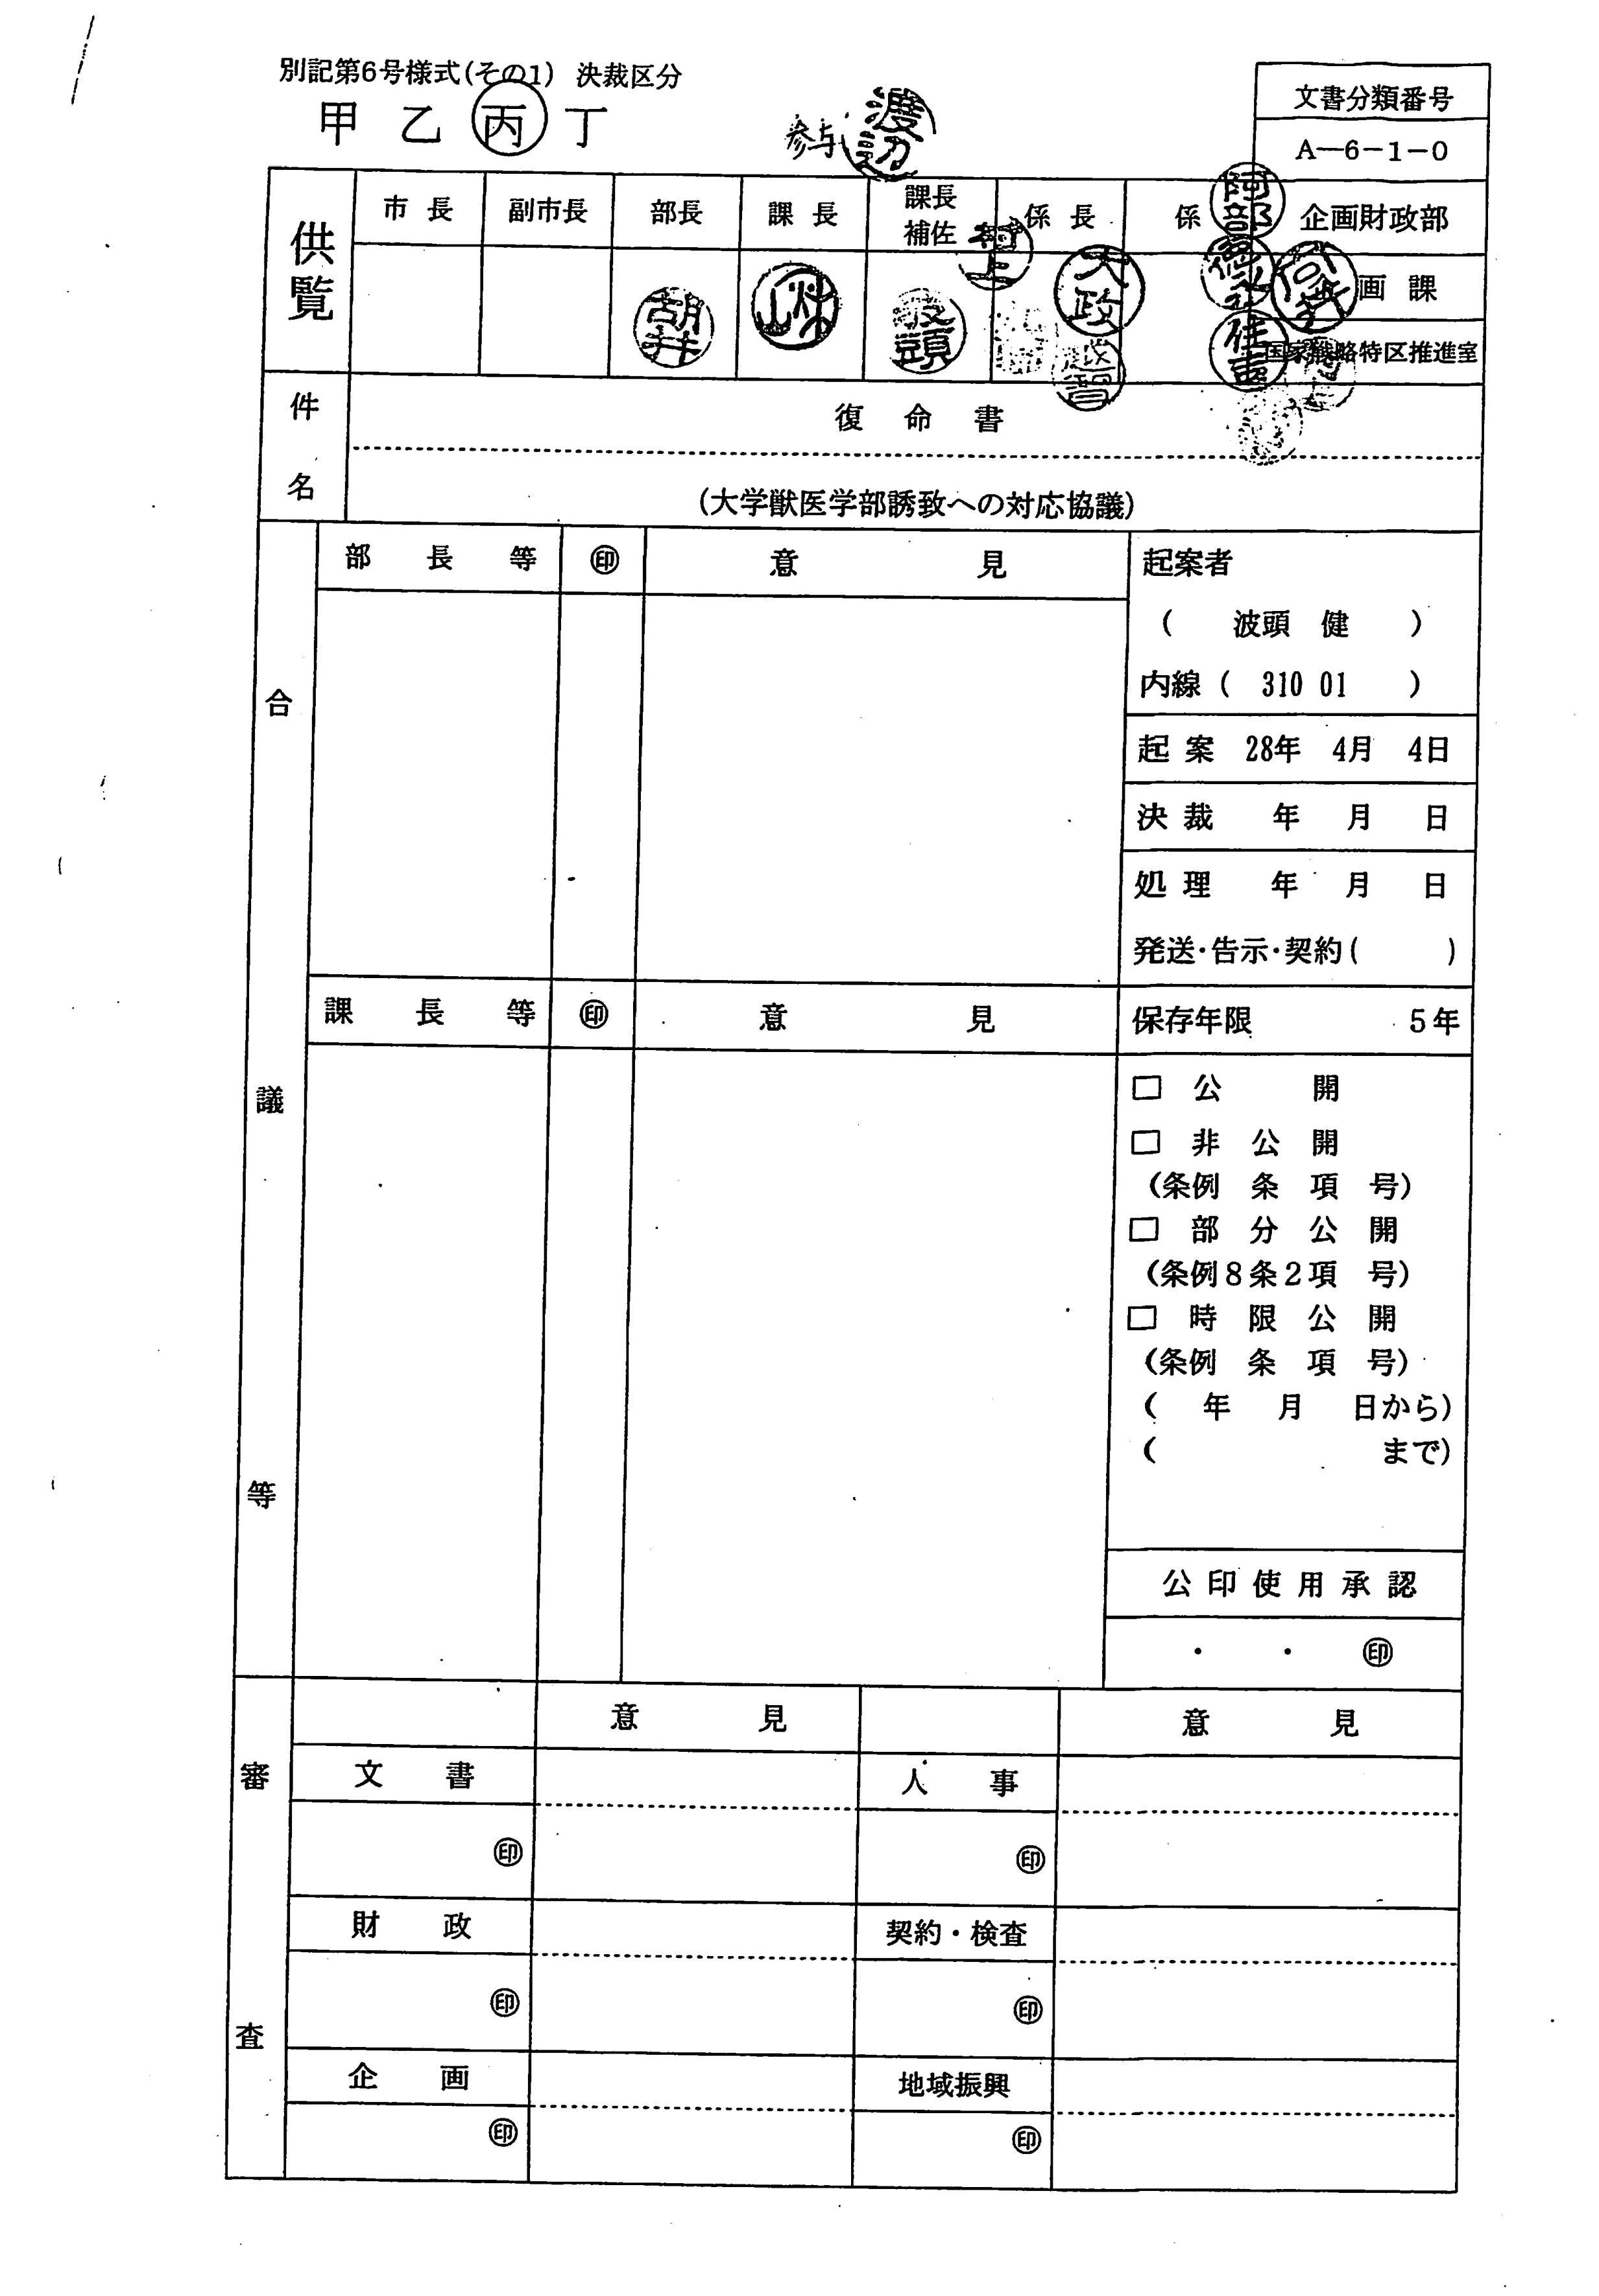 今治市 20160404東京出張 国家戦略特区(大学獣医学部の誘致等)に関する協議 (3)